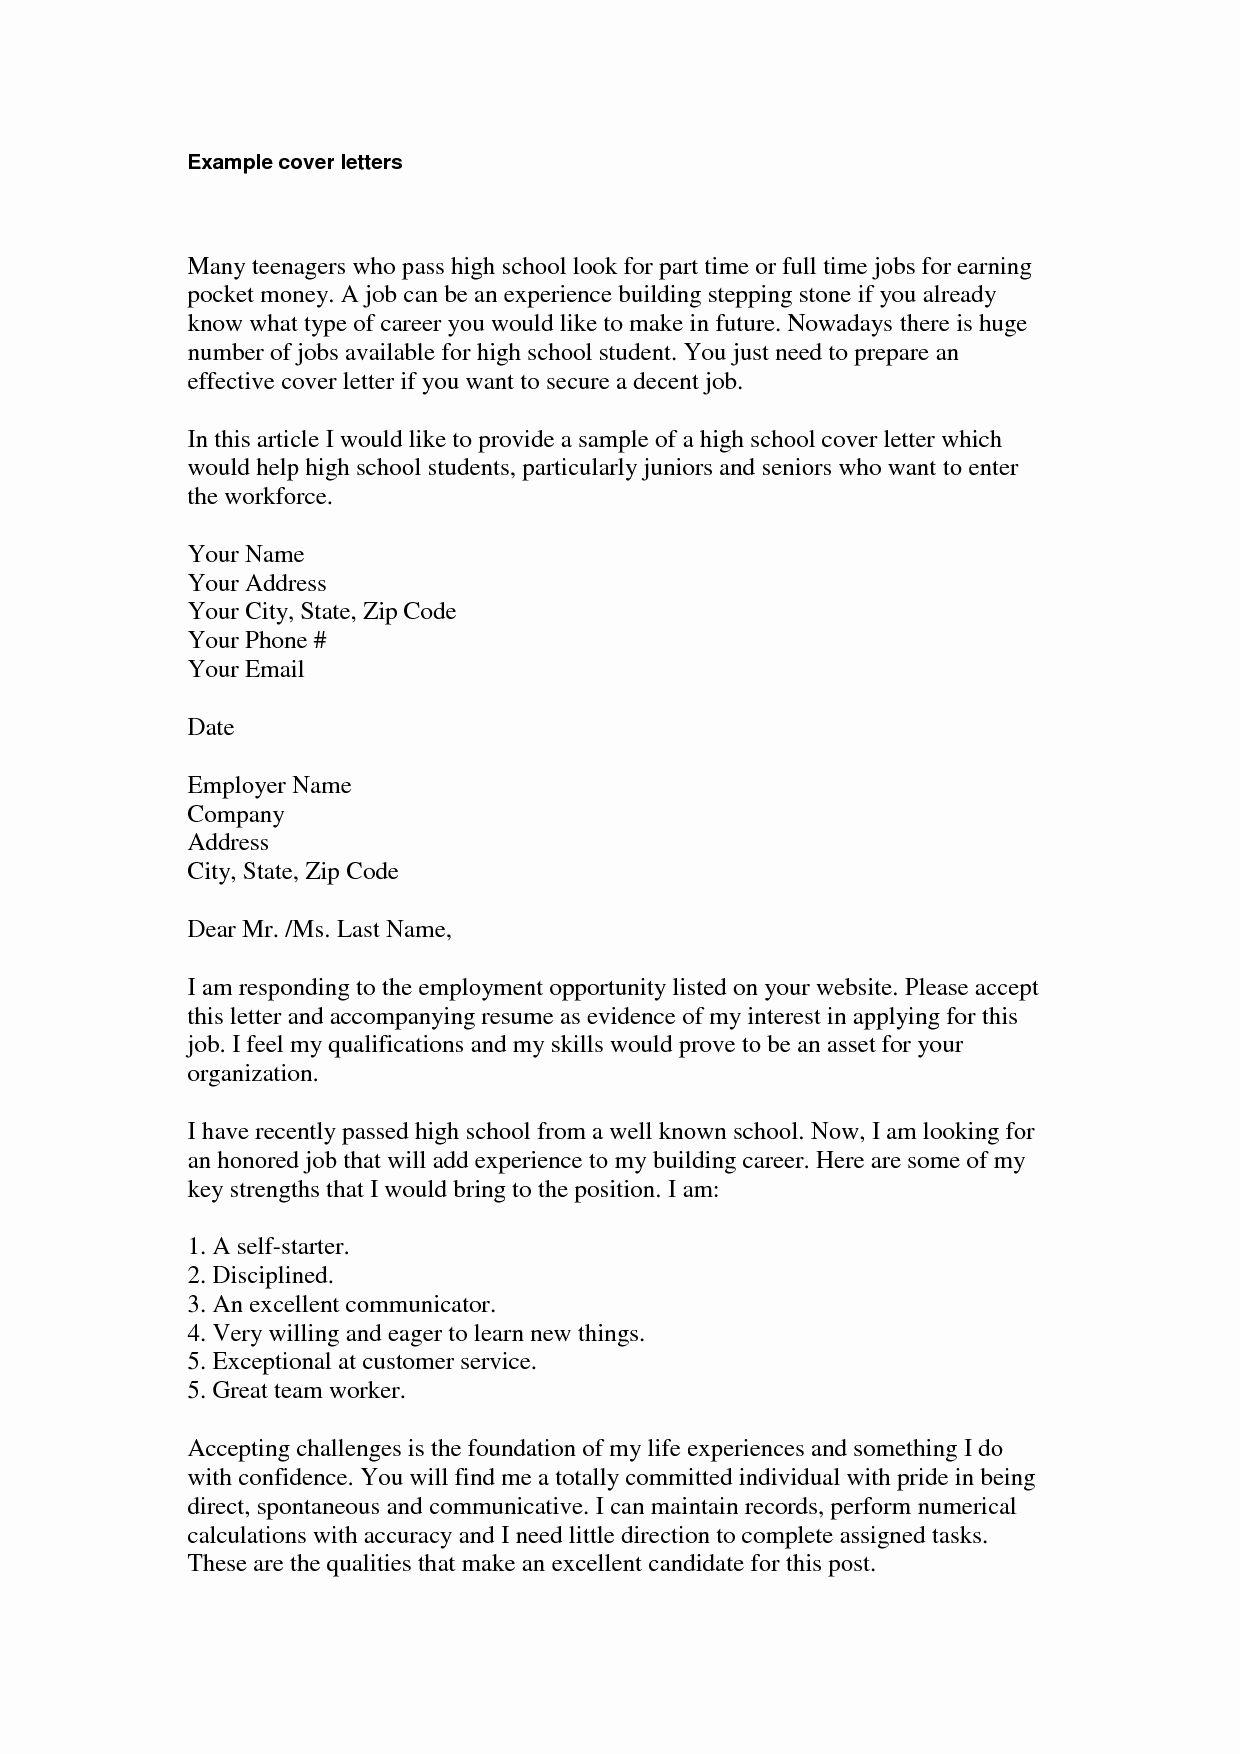 Part Time Job Resume Fresh Application Letter For A Part Time Job Job Resume Examples Job Resume Creative Writing Essays